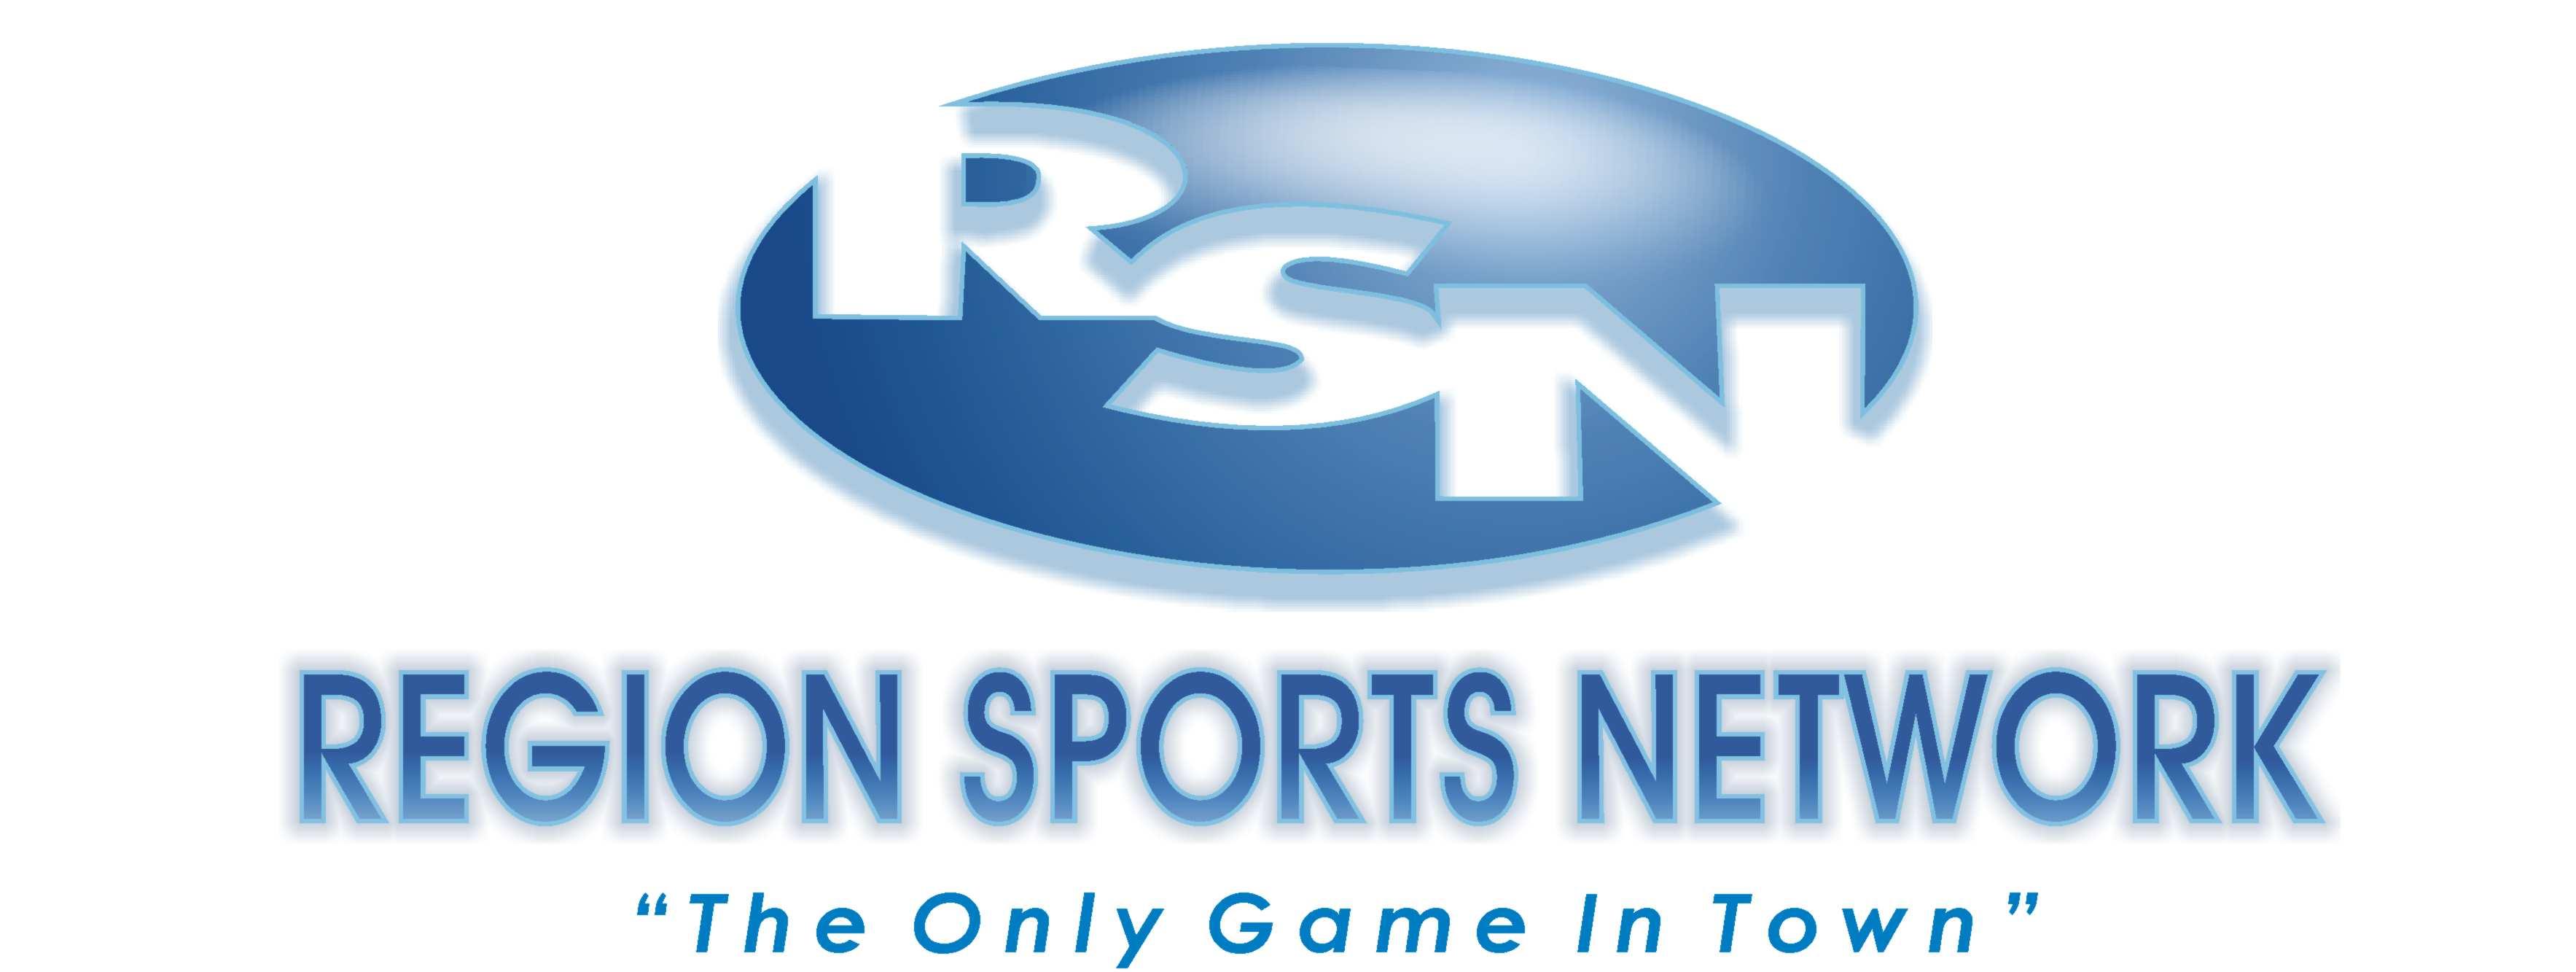 Region Sports Network